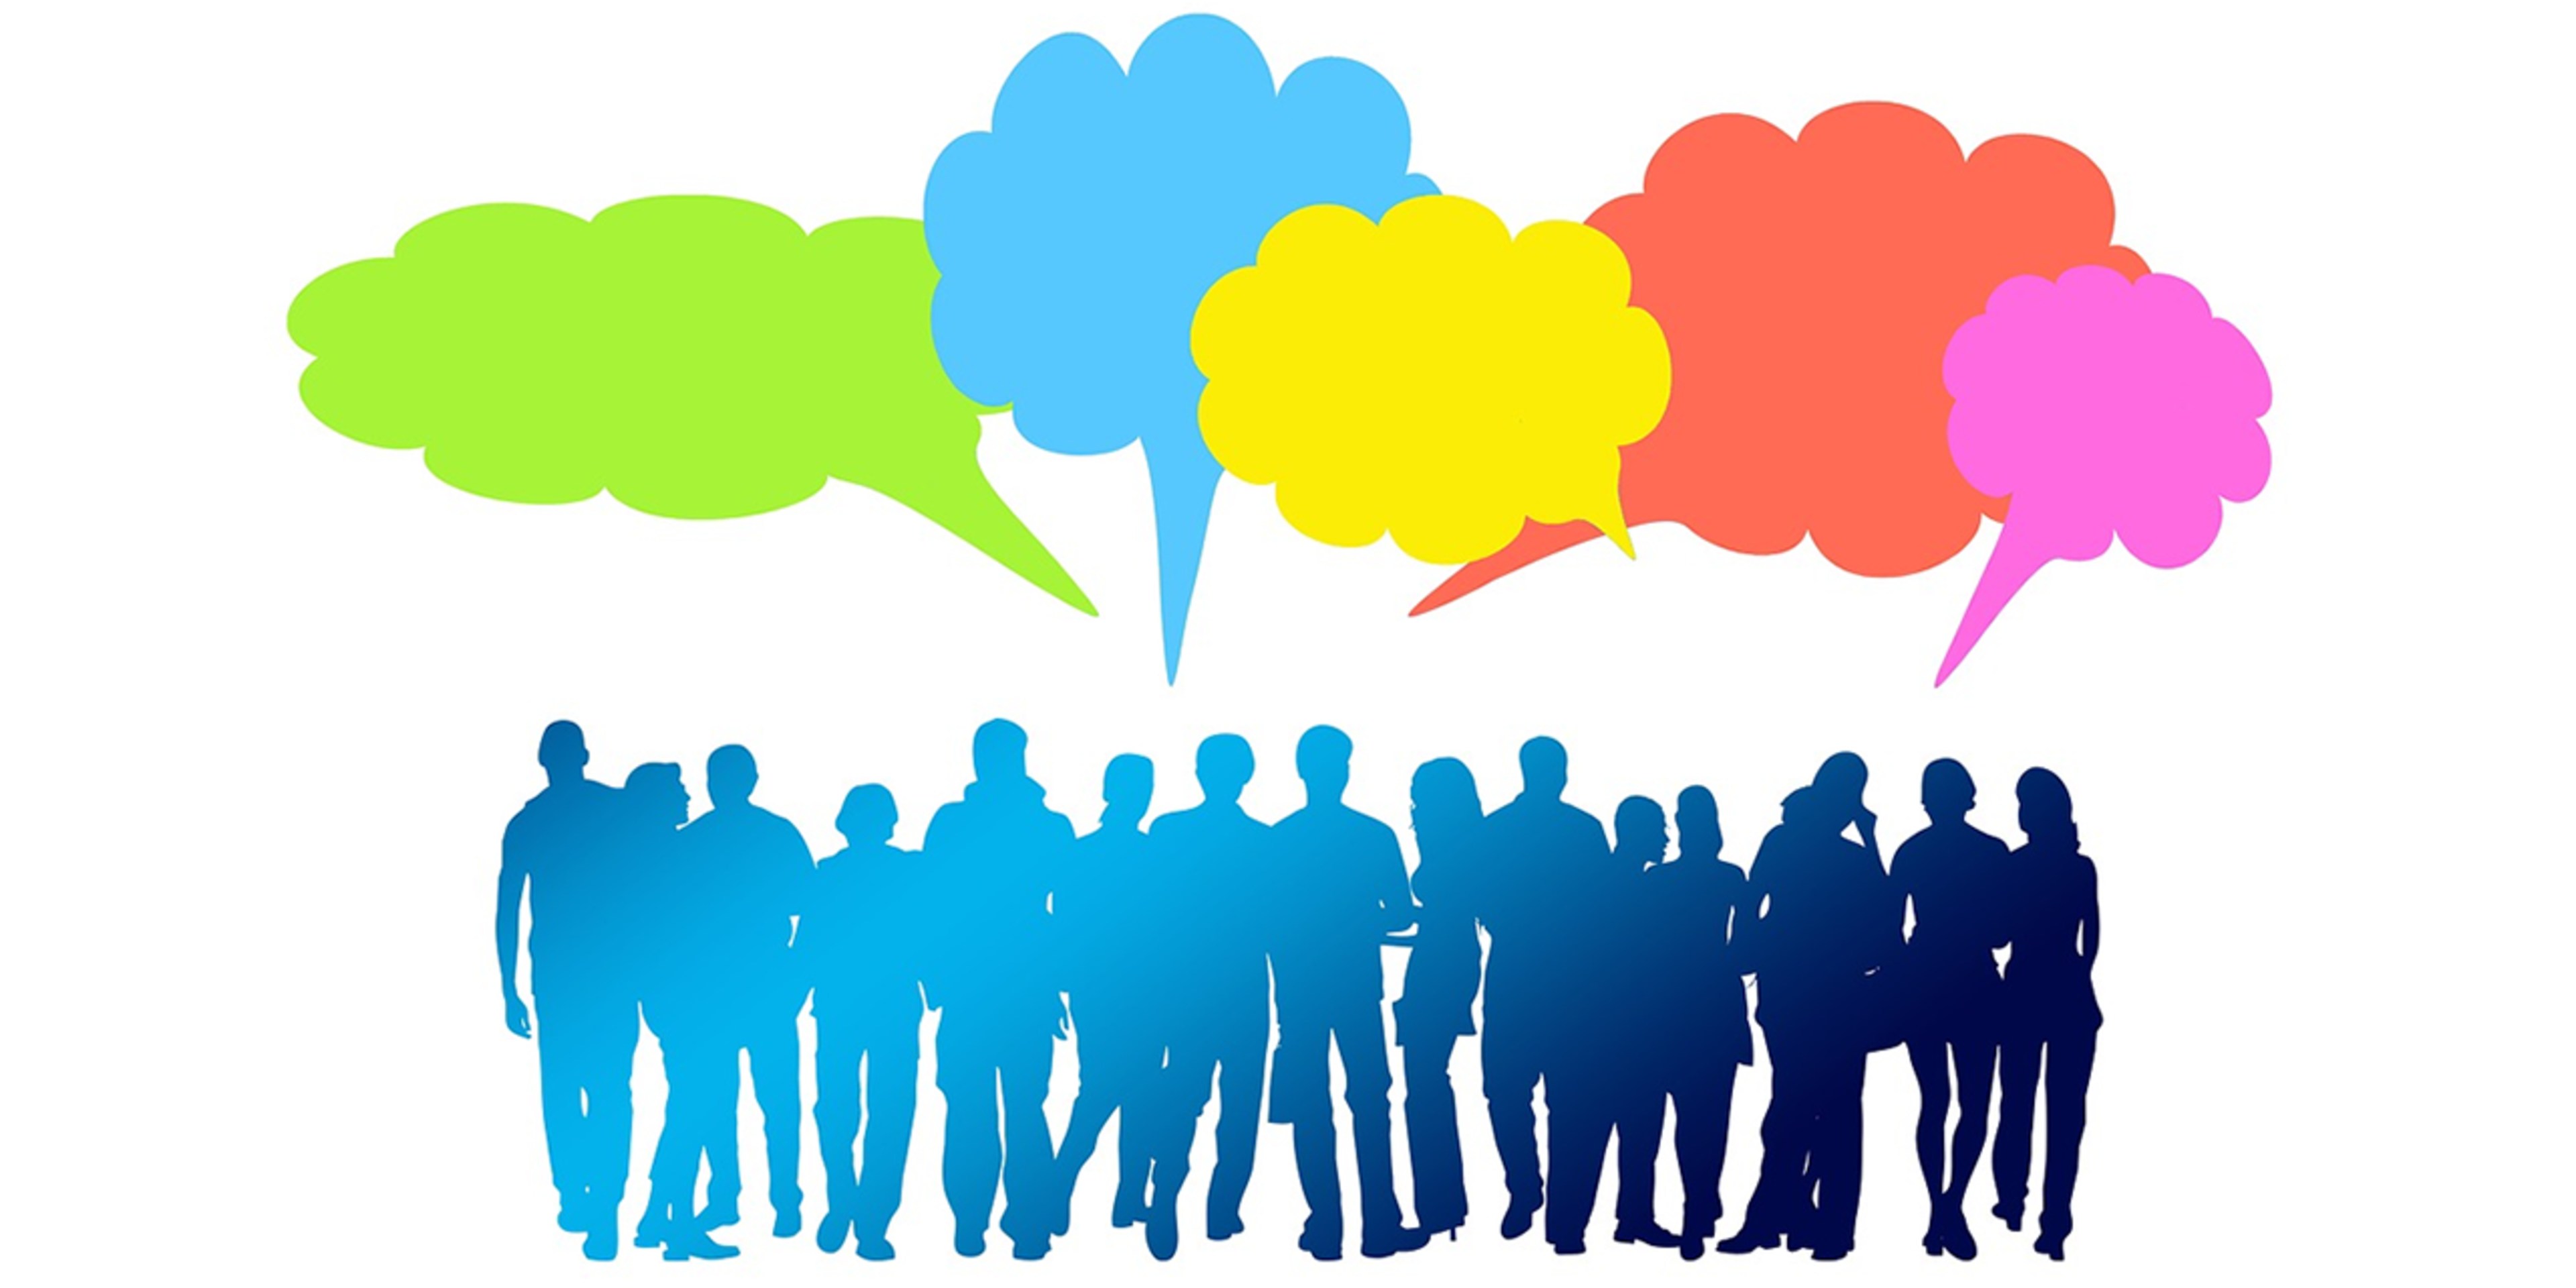 6 Effects of Poor Employee Communication